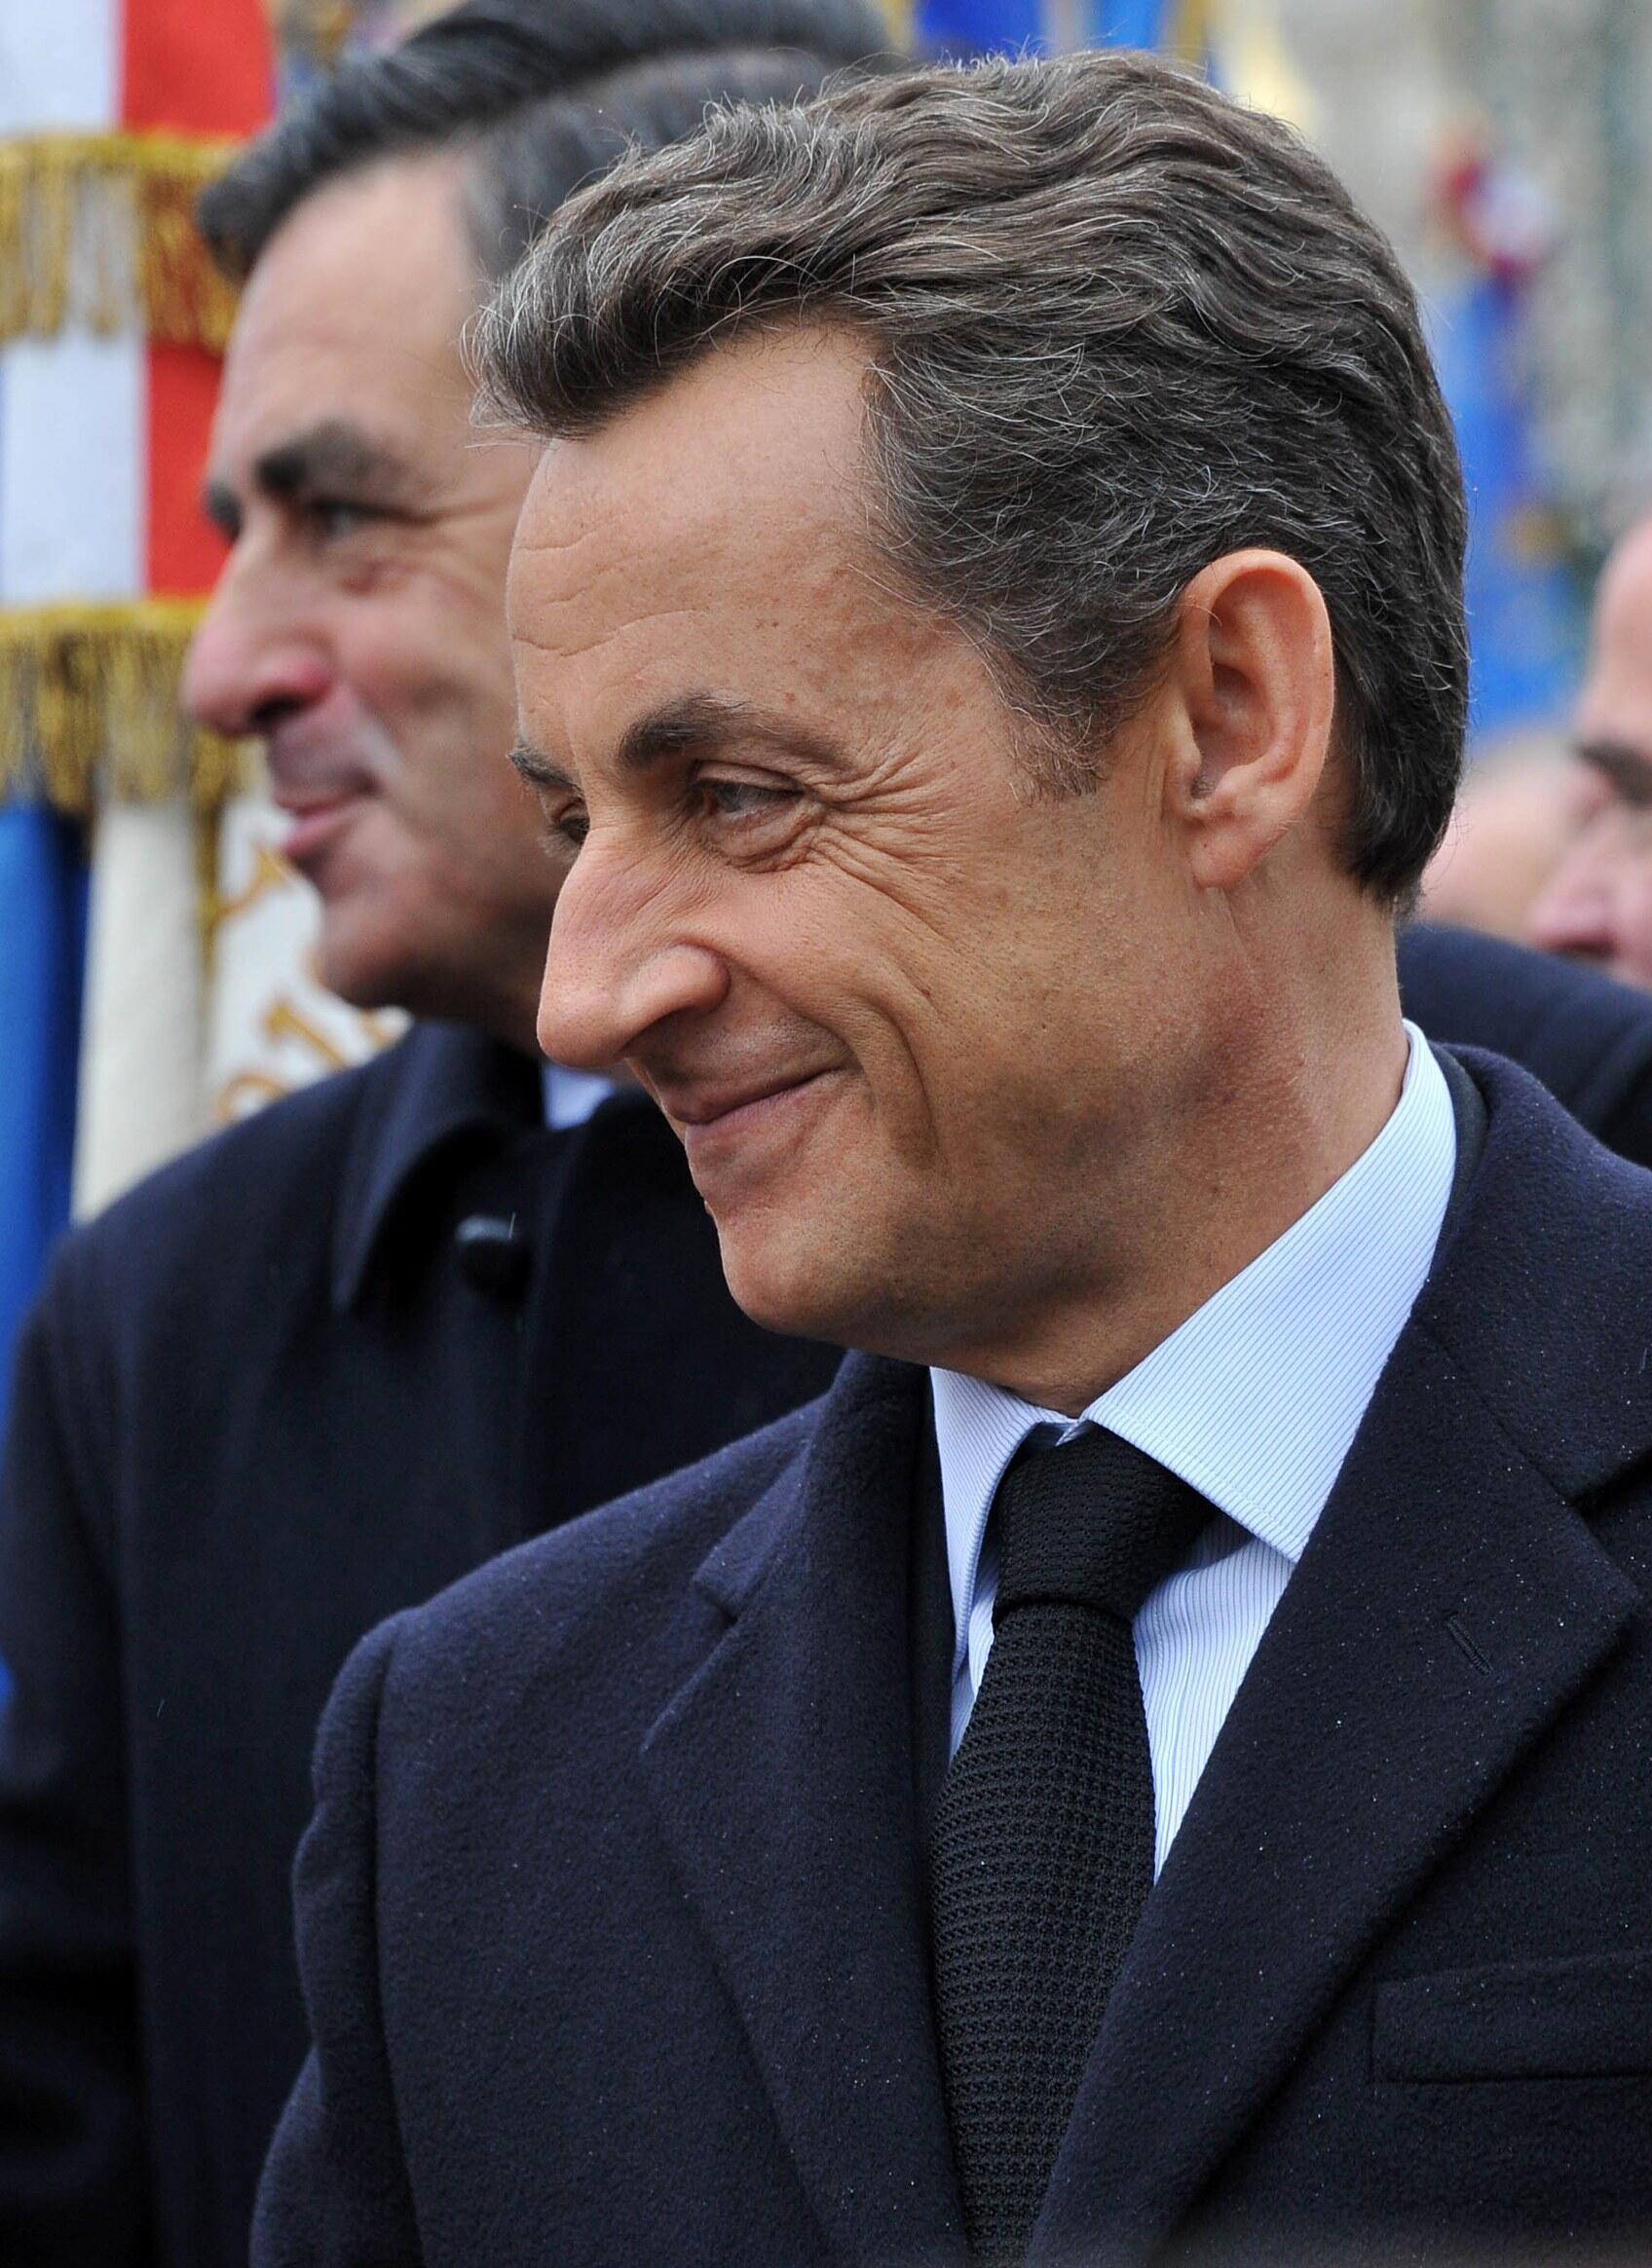 Nicolas Sarkozy and François Fillon